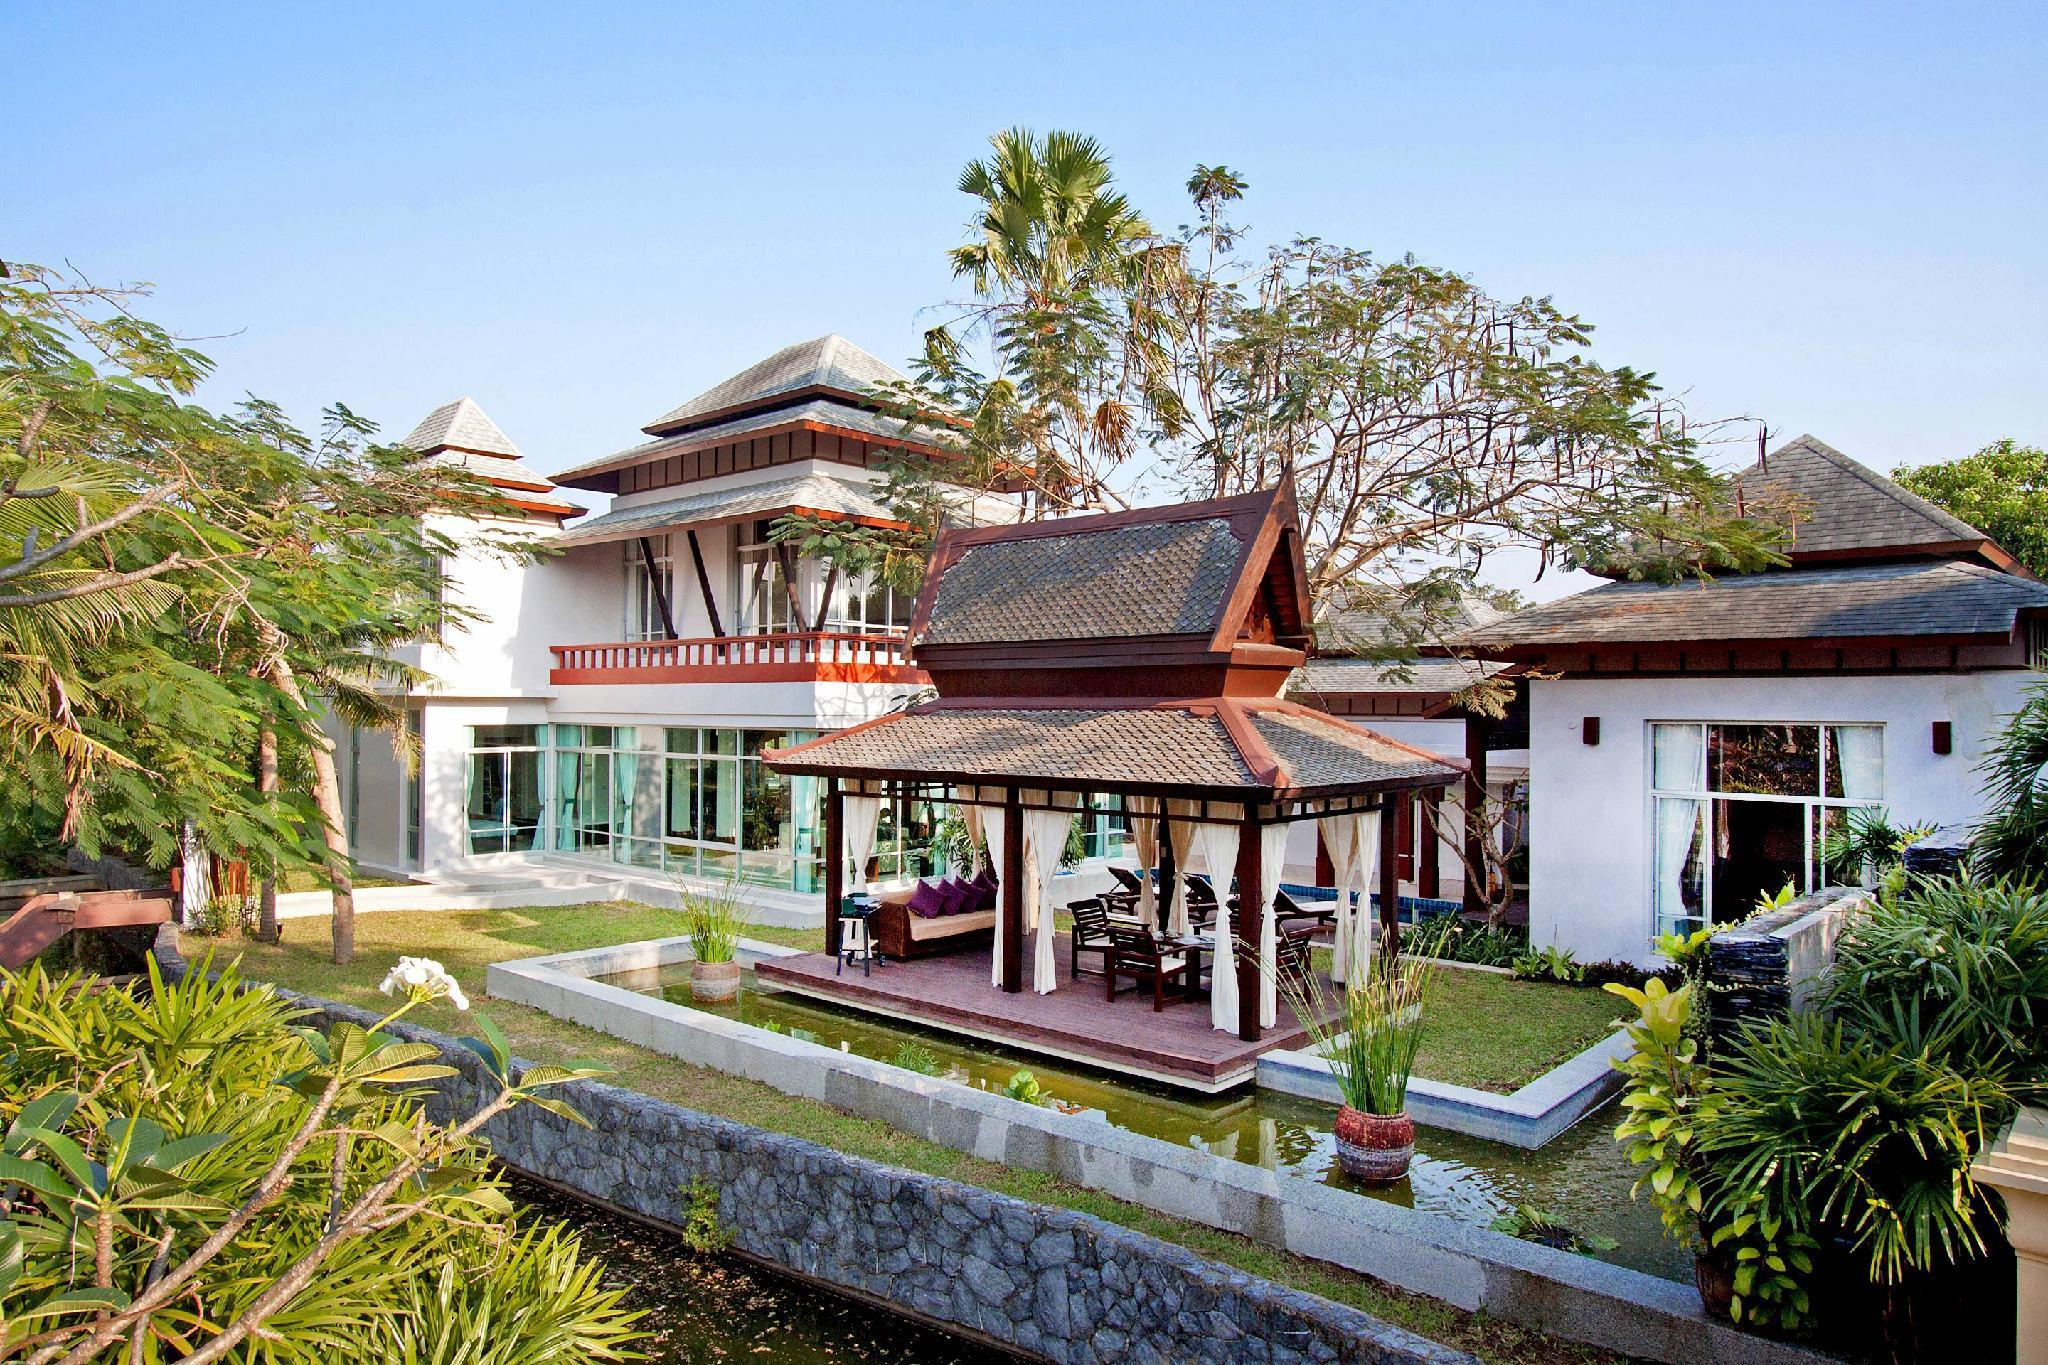 Baan Mork Nakara   5 BR Pool Villa in East Pattaya 5 ห้องนอน 6 ห้องน้ำส่วนตัว ขนาด 290 ตร.ม. – เขาตาโล